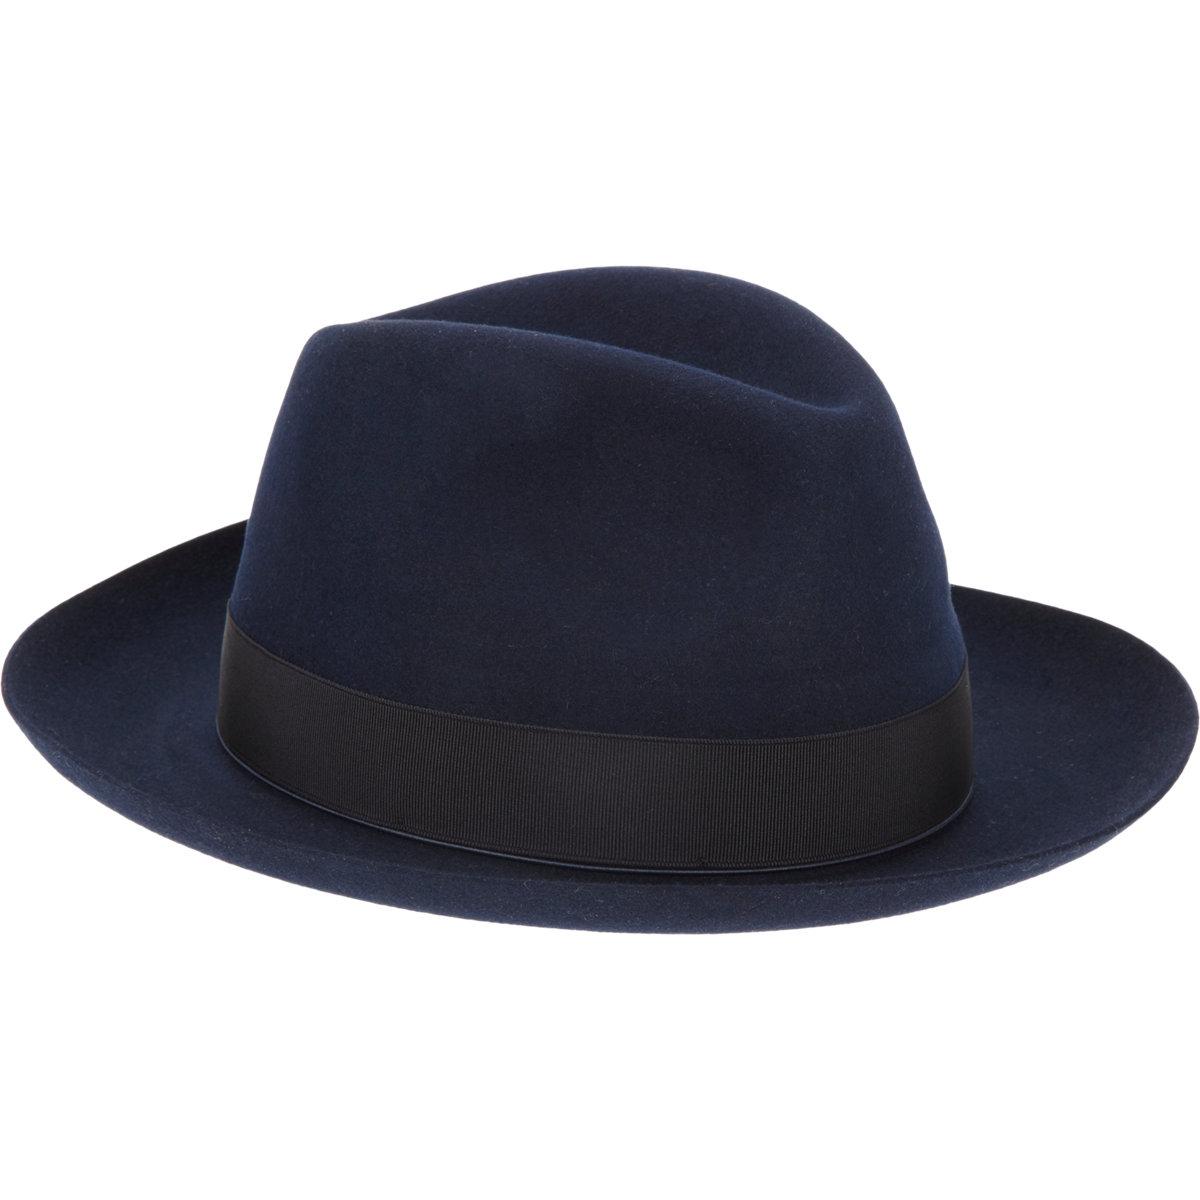 Lyst - Borsalino Rabbit Fur Felt Fedora in Blue for Men b3536ffb6fe